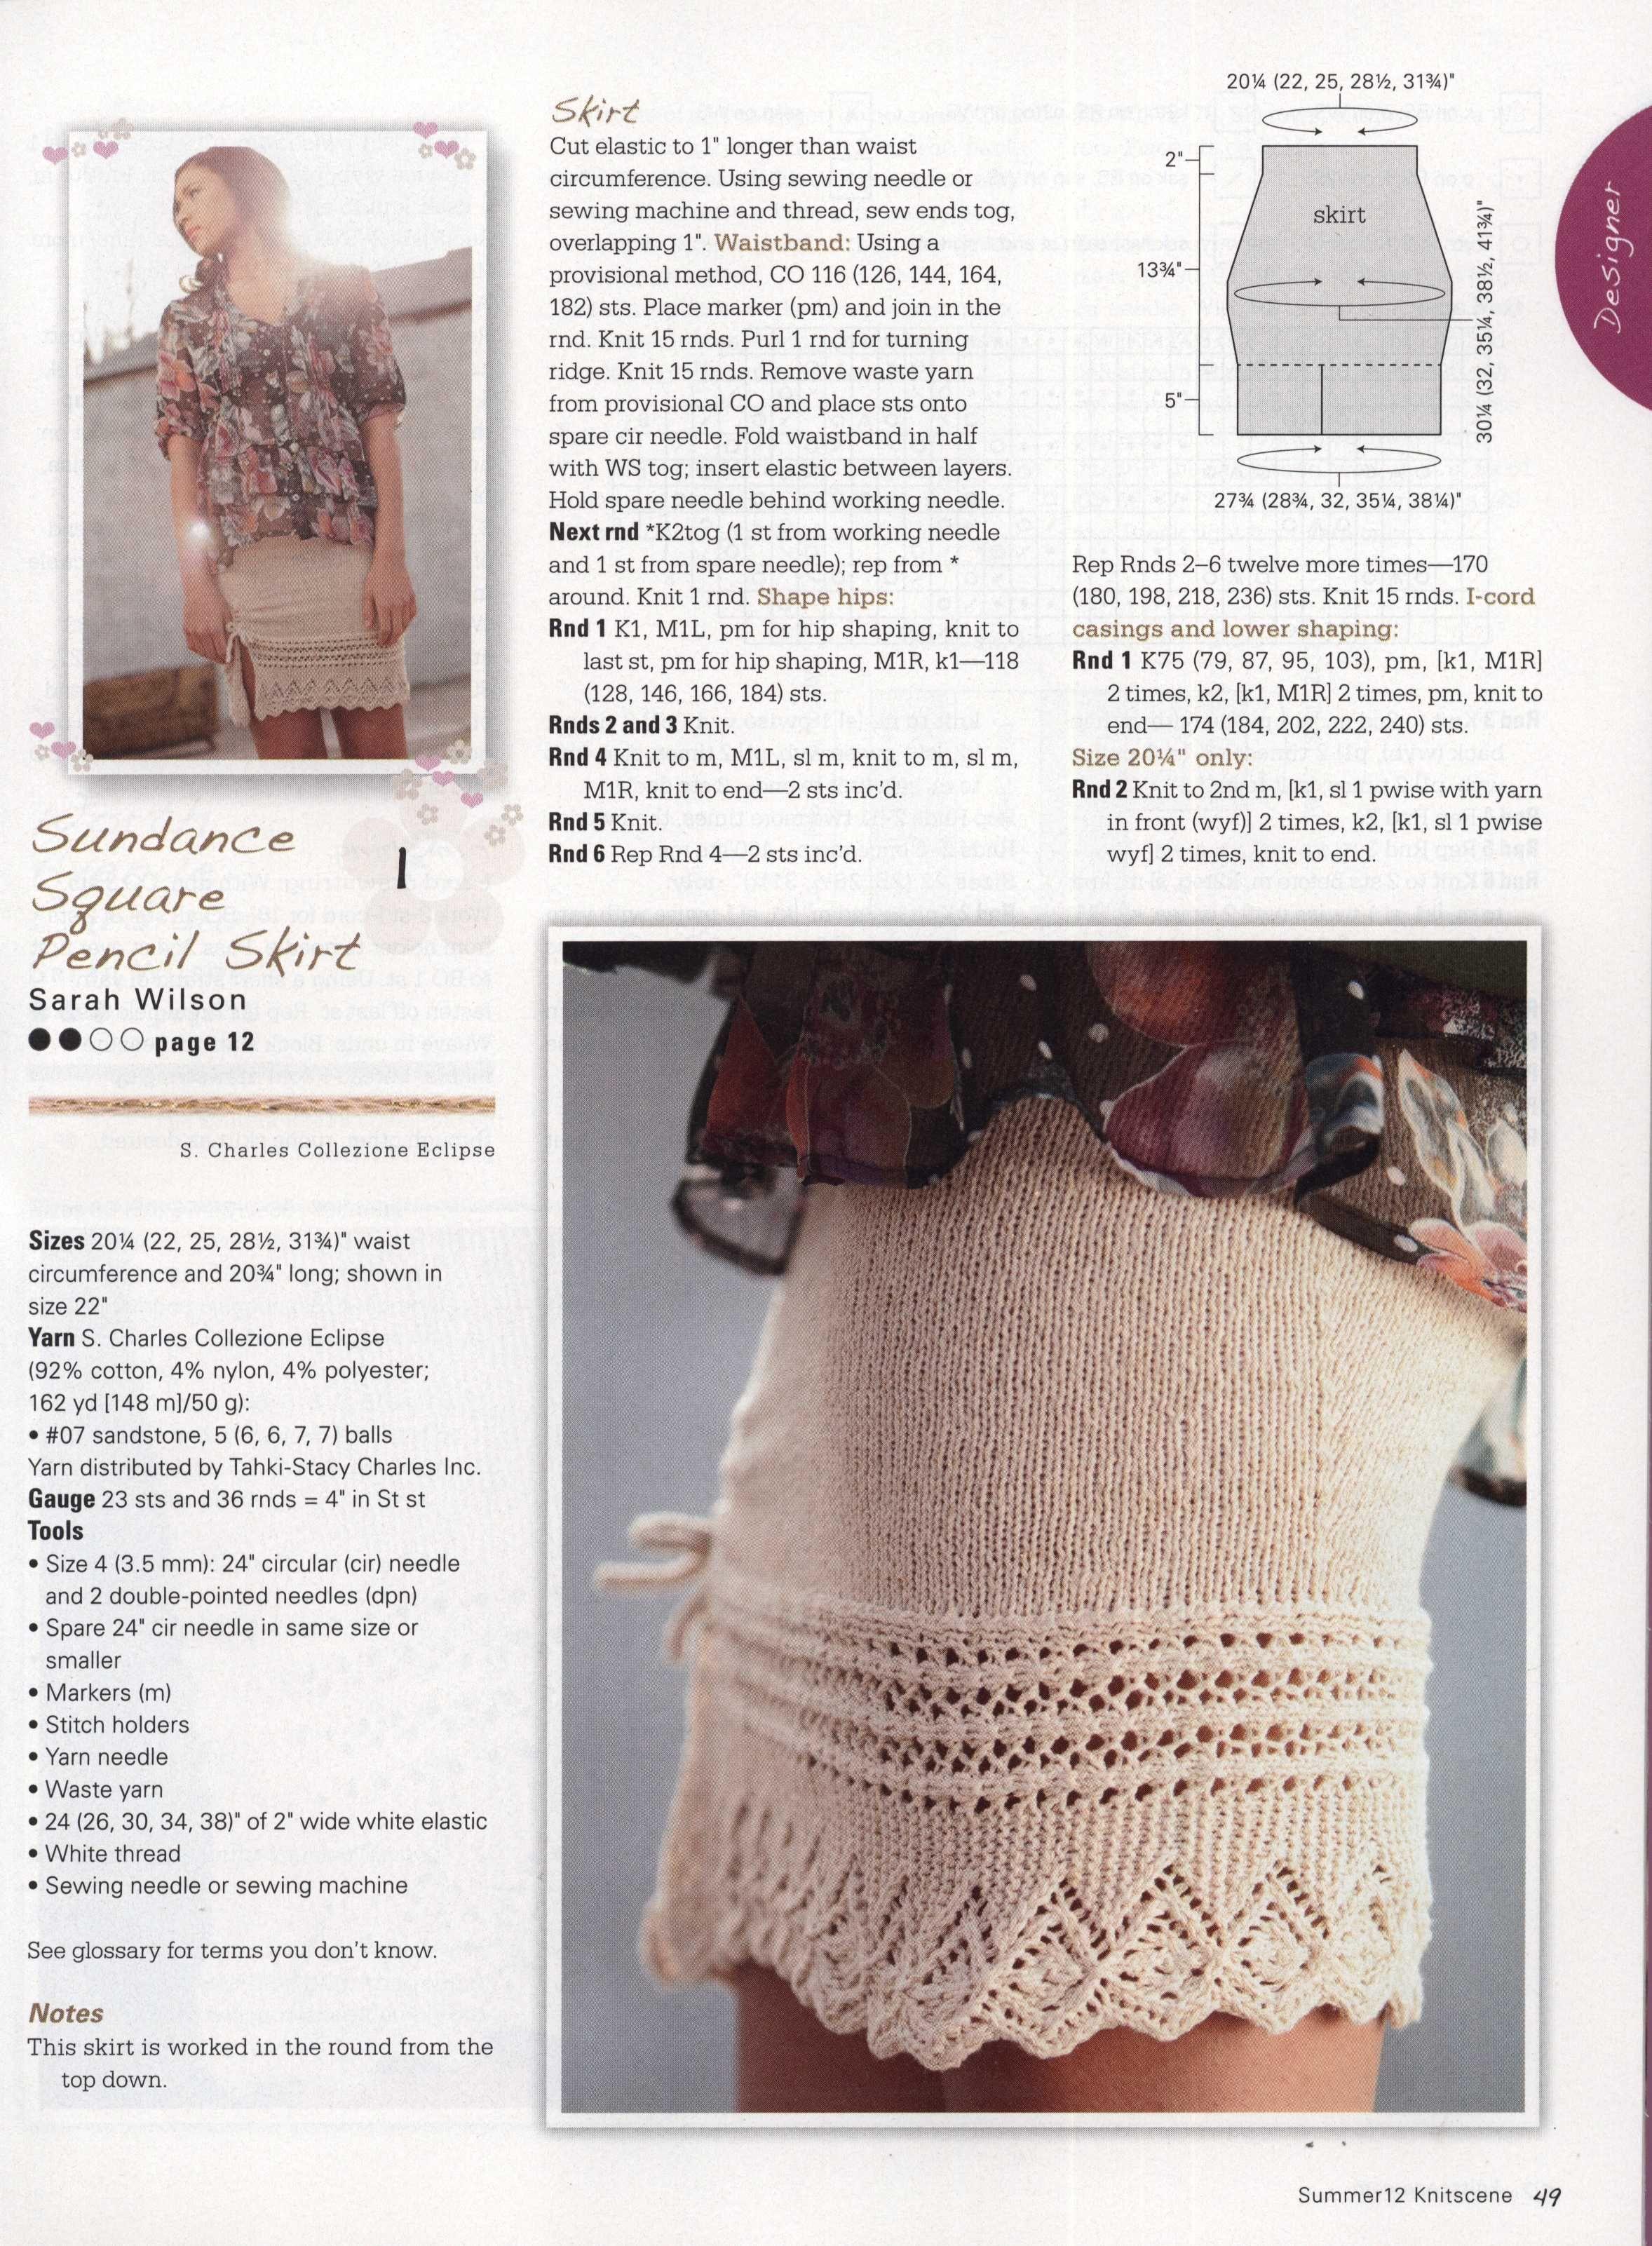 knitting skirt FREE PATTERN   3000 FREE patterns to knit   http://pinterest.c...